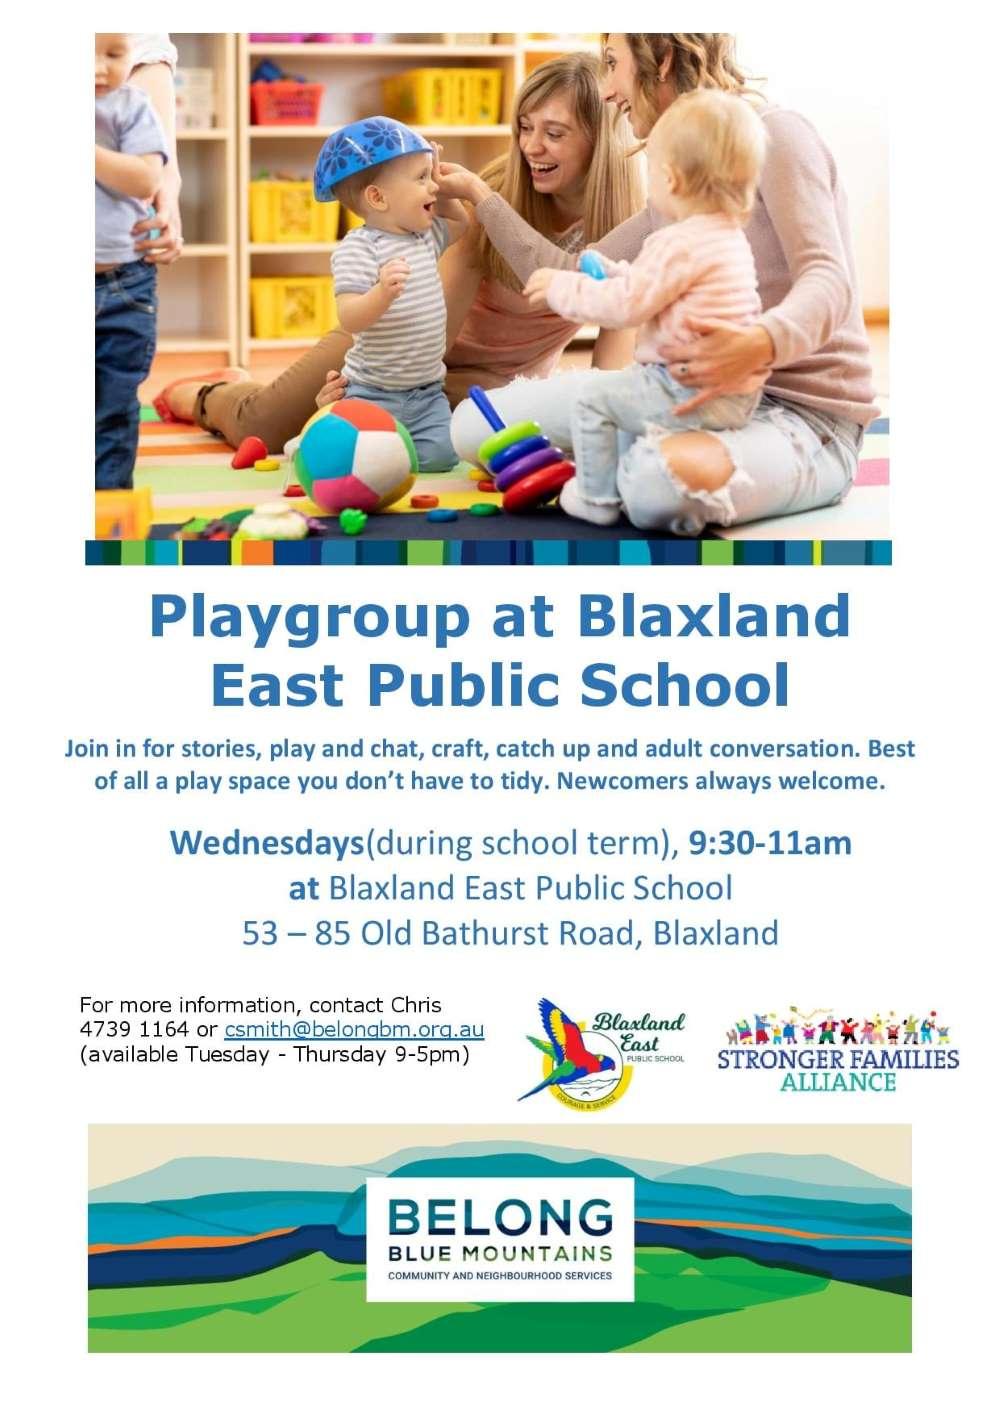 blaxland east public school playgroup lowerv blue mountains